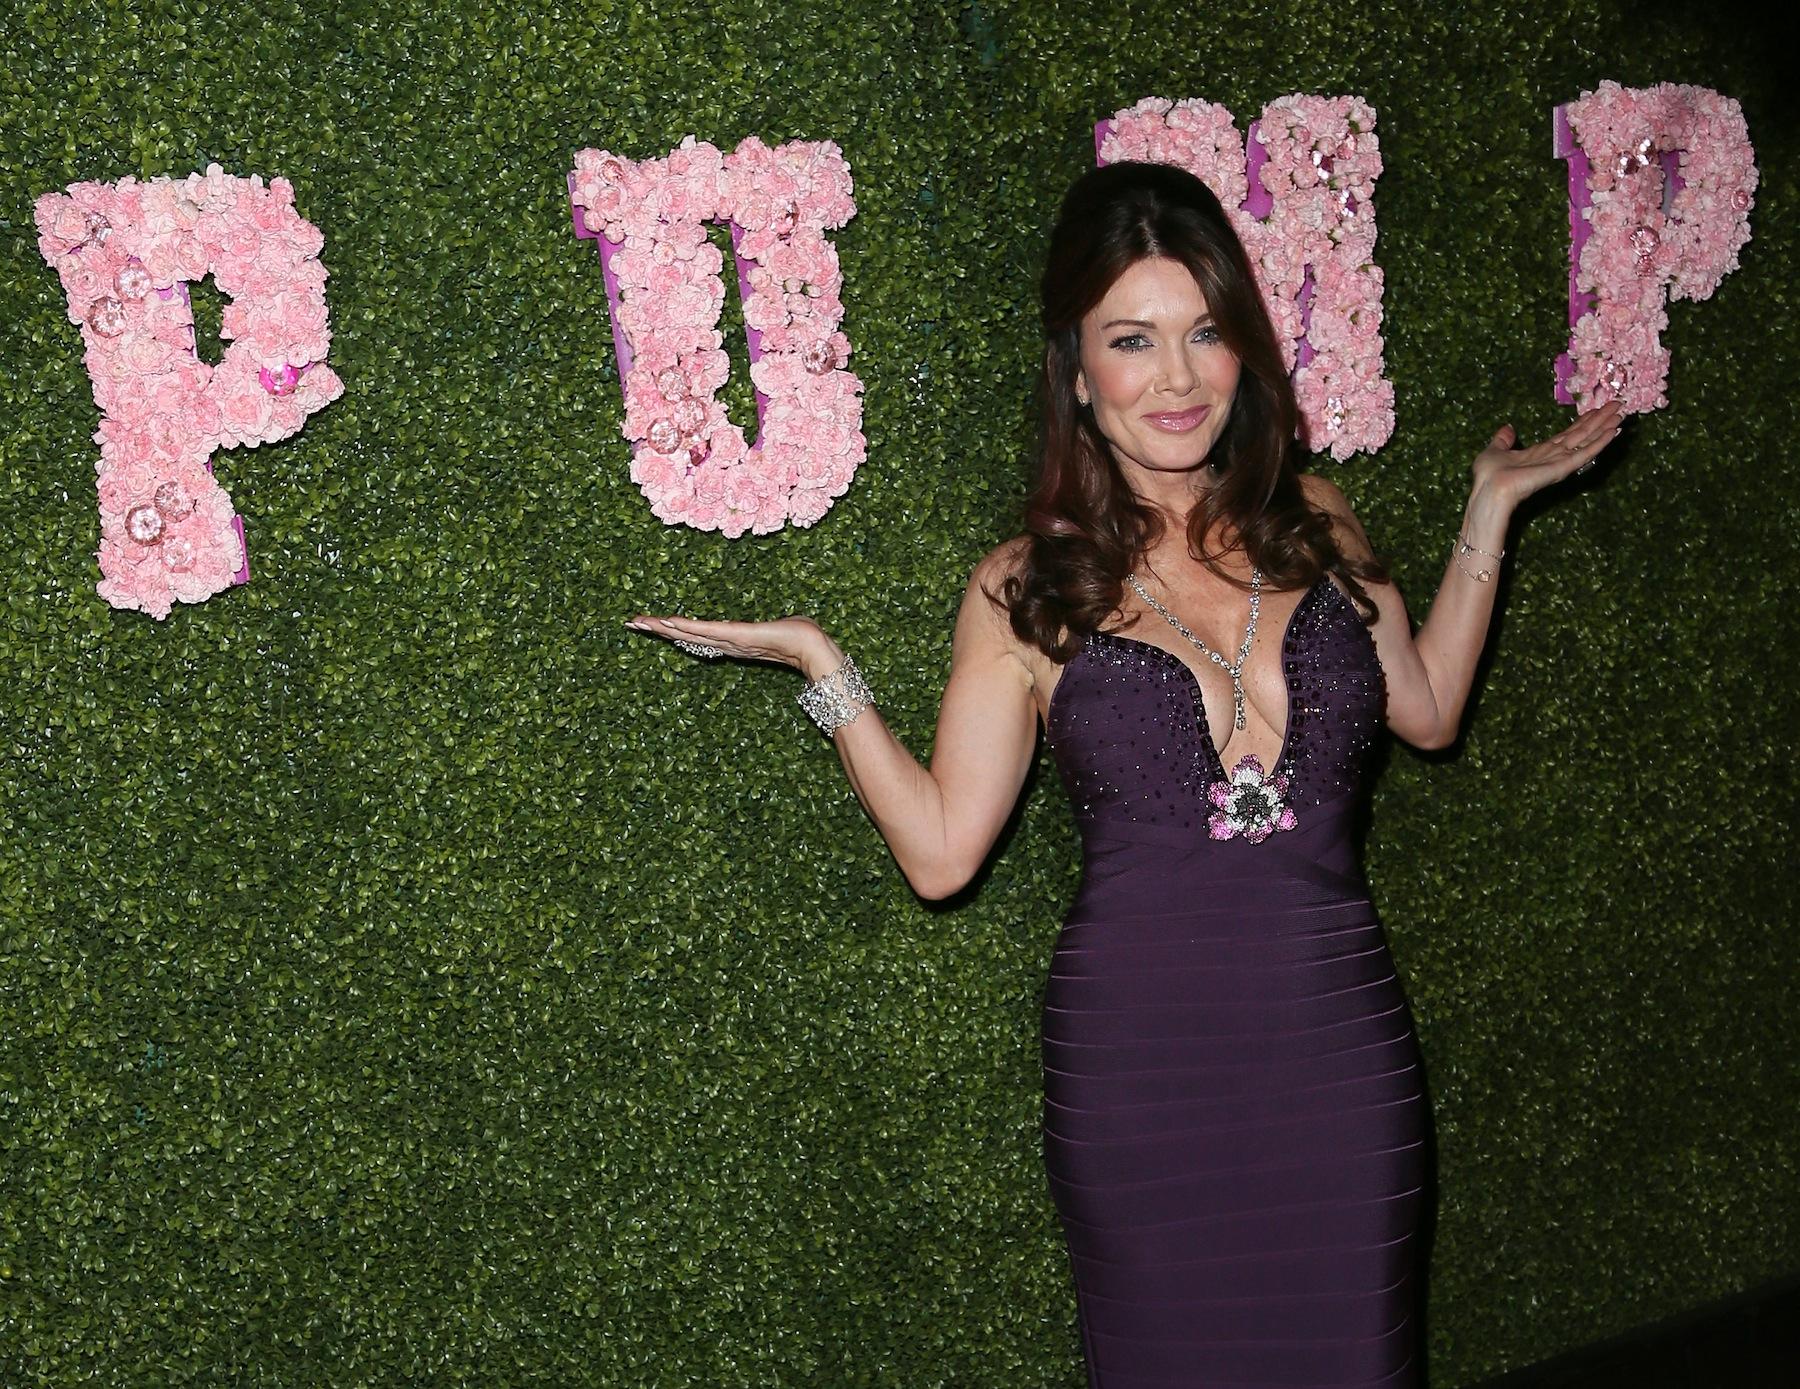 Lisa Vanderpump attends the grand opening of Pump Lounge hosted by Lisa Vanderpump and Ken Todd at Pump on May 13, 2014 in West Hollywood, Calif.